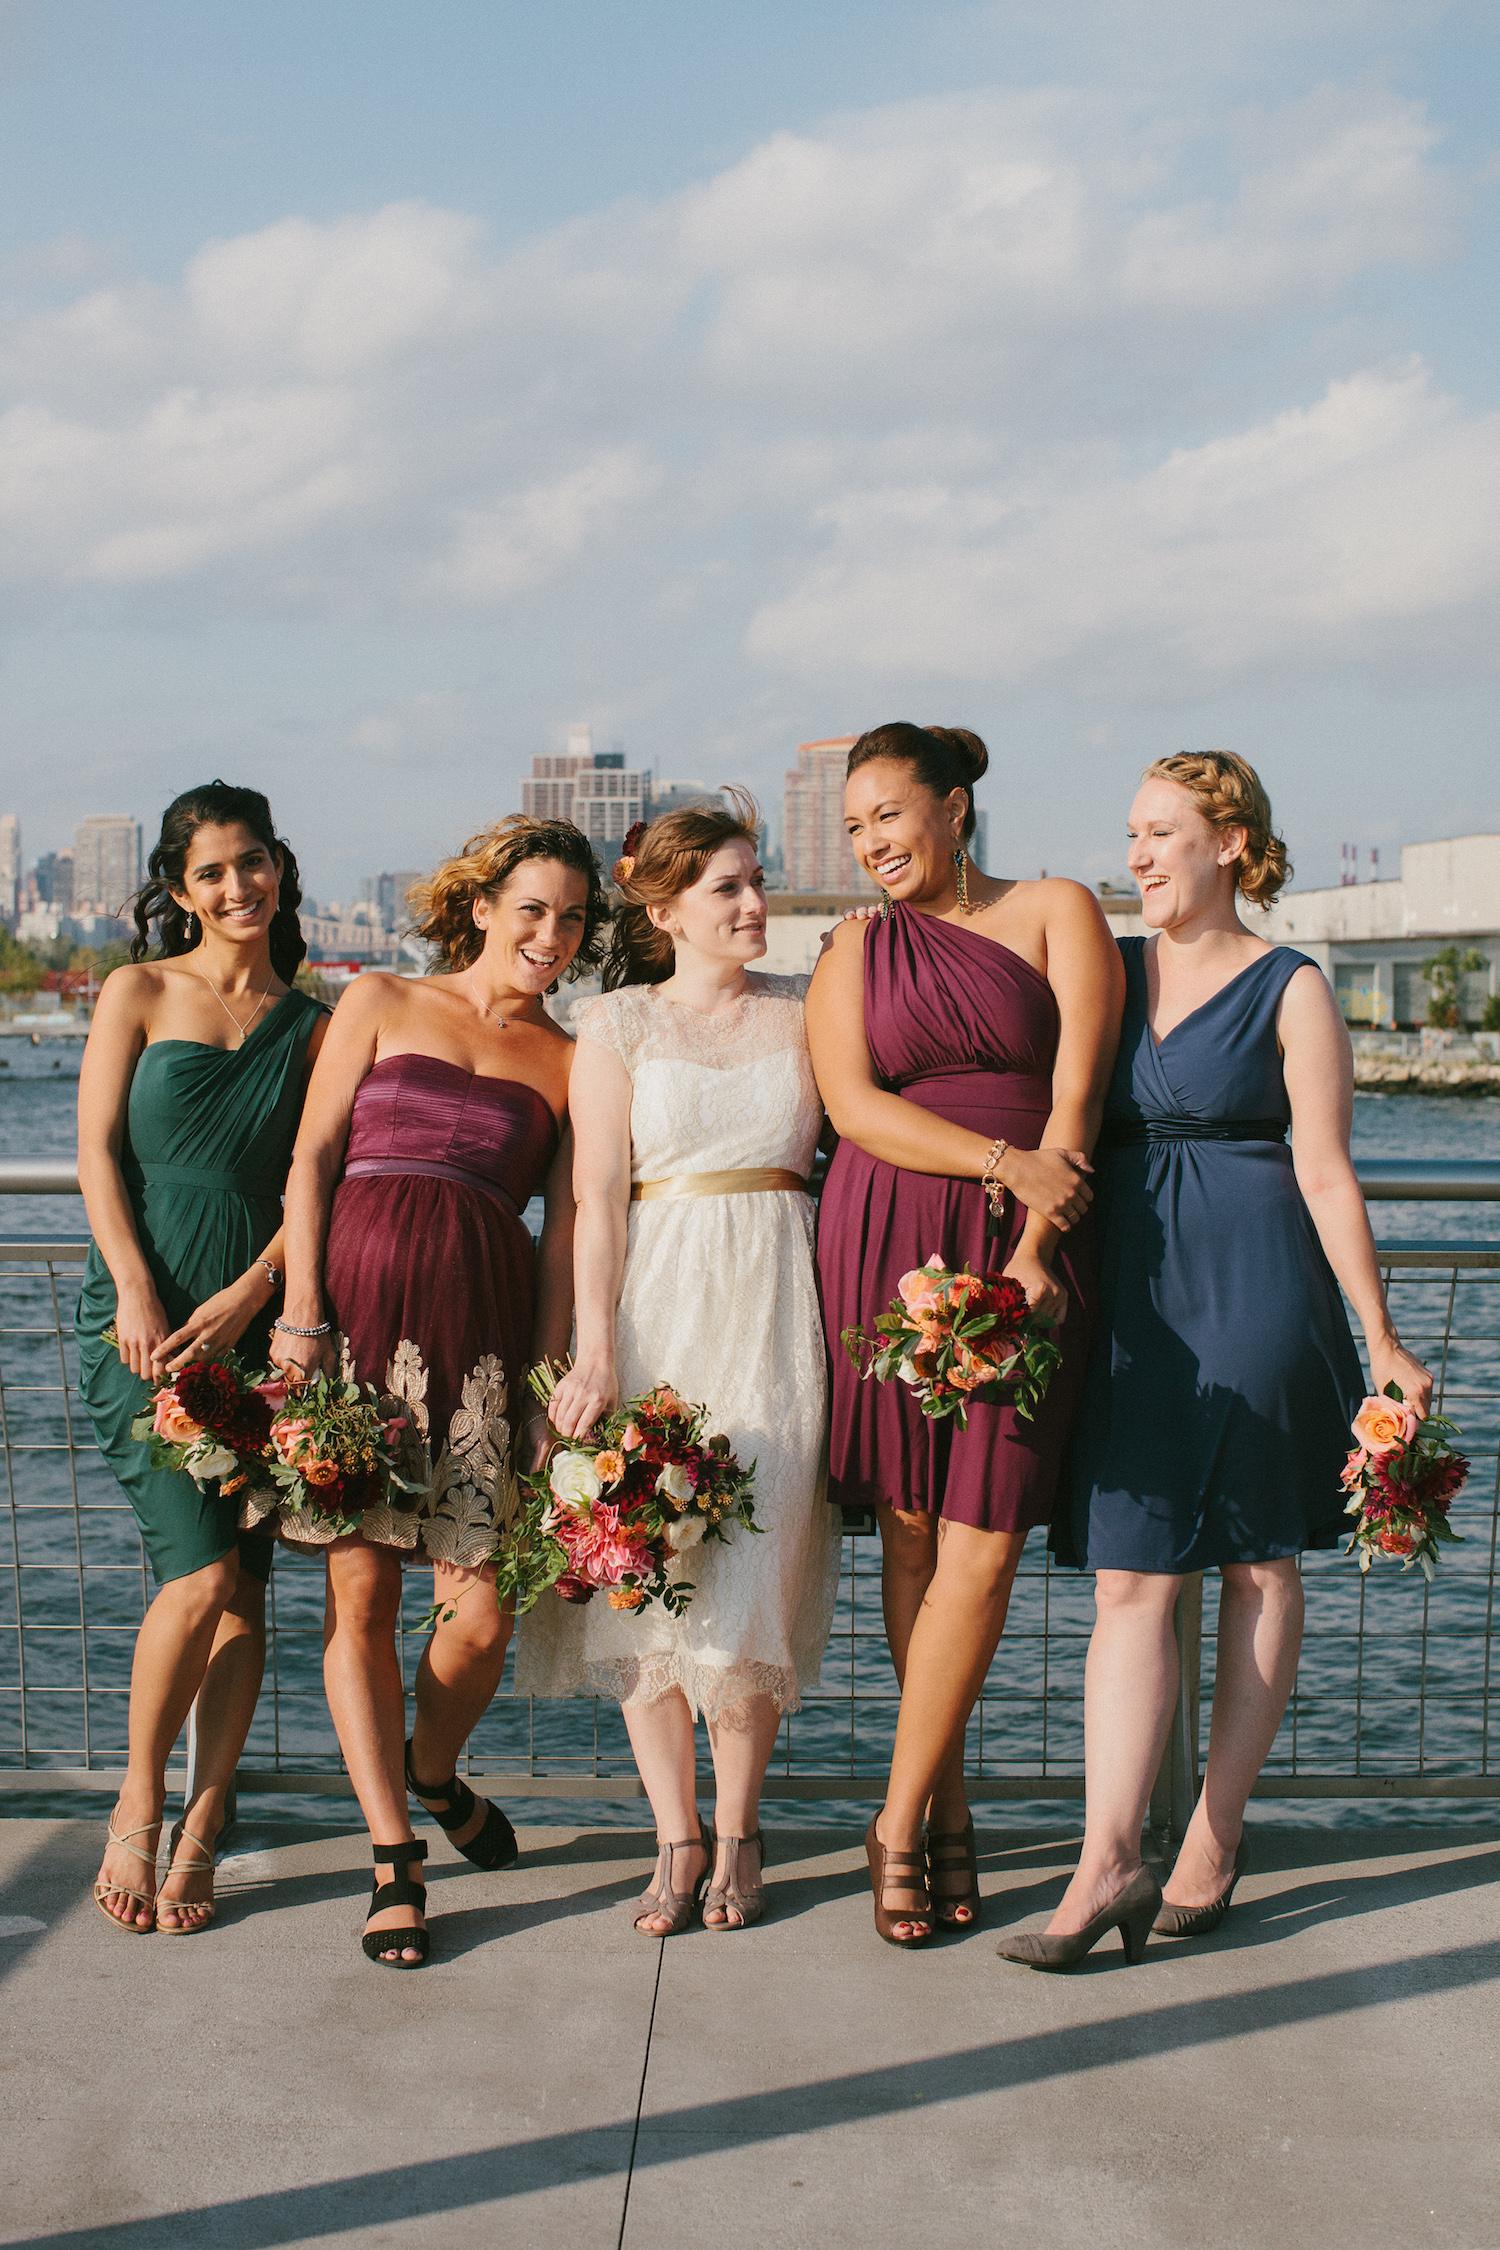 Full Aperture Floral & Corey Torpie Photography  - Brooklyn Wedding - 51.jpeg